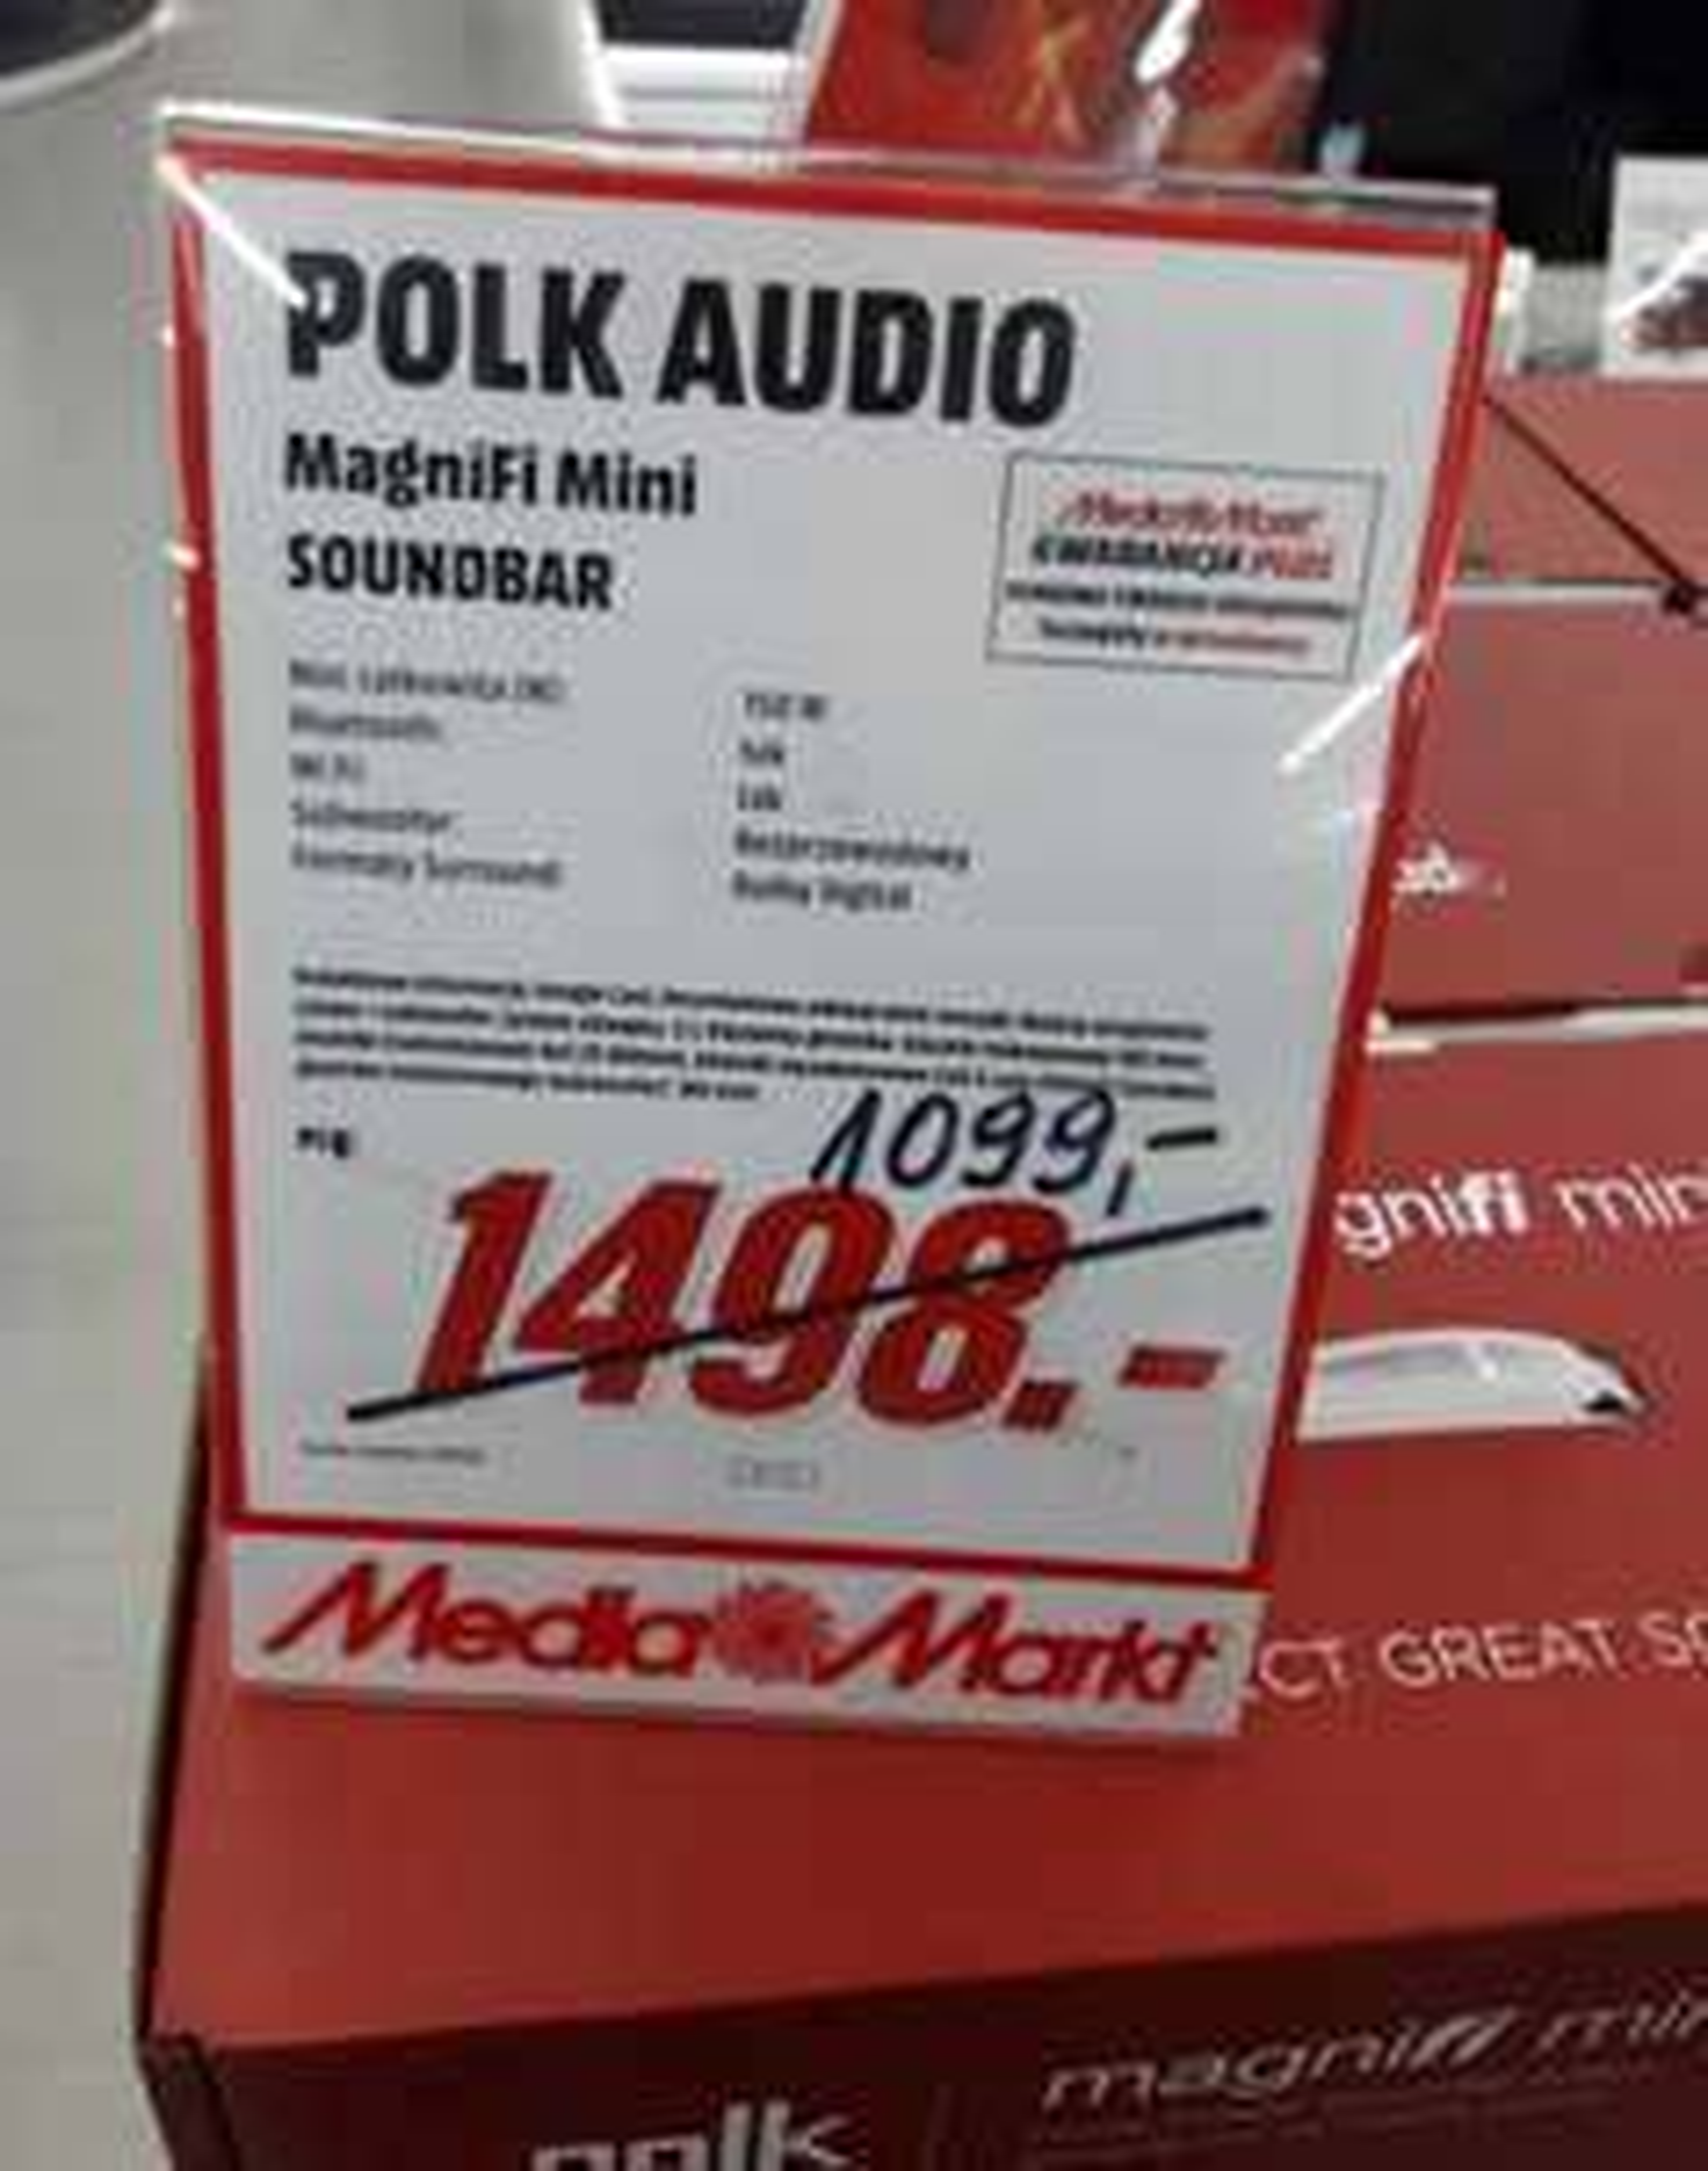 Soundbar POLK AUDIO Magnifi Mini - Media Markt Katowice